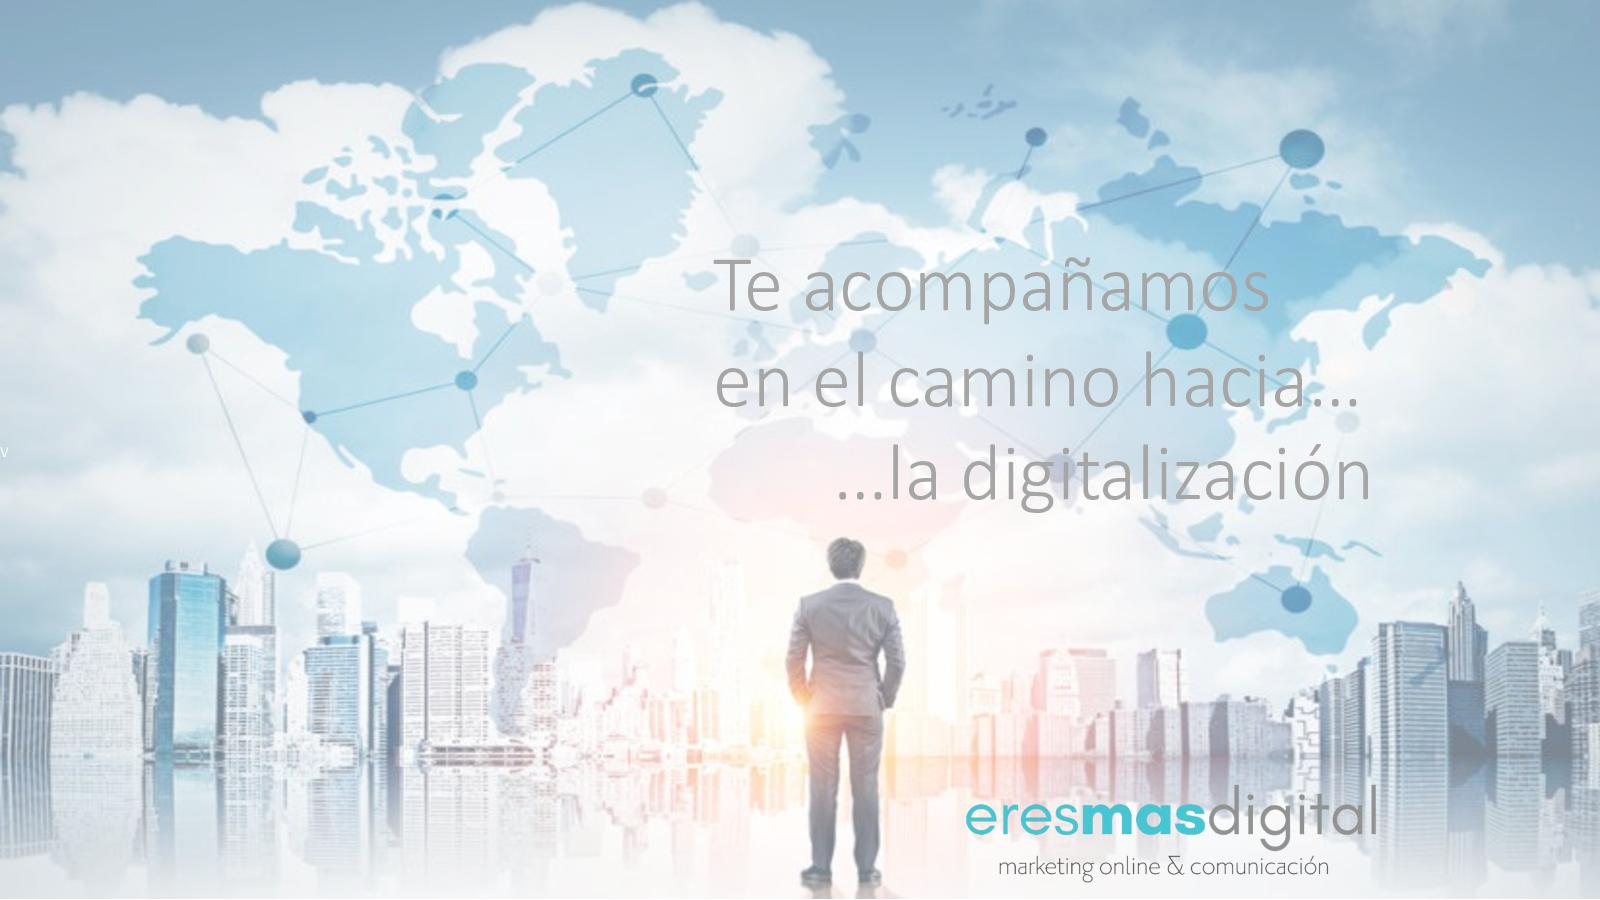 P Marketing Digital Eresmasdigital V 1